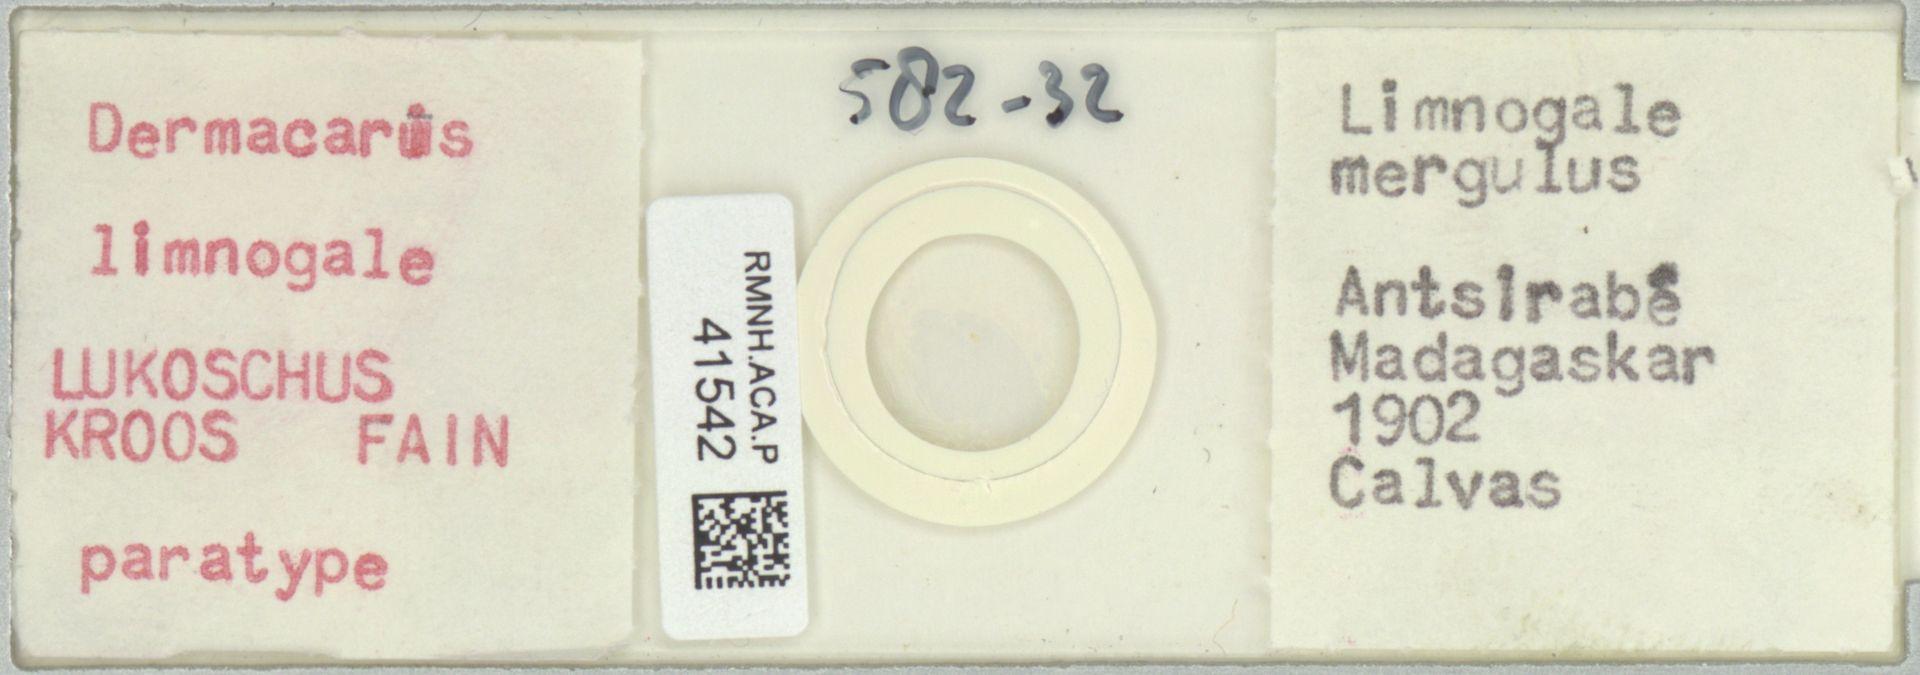 RMNH.ACA.P.41542 | Dermacarus limnogale Lukoschus, Kroos, Fain